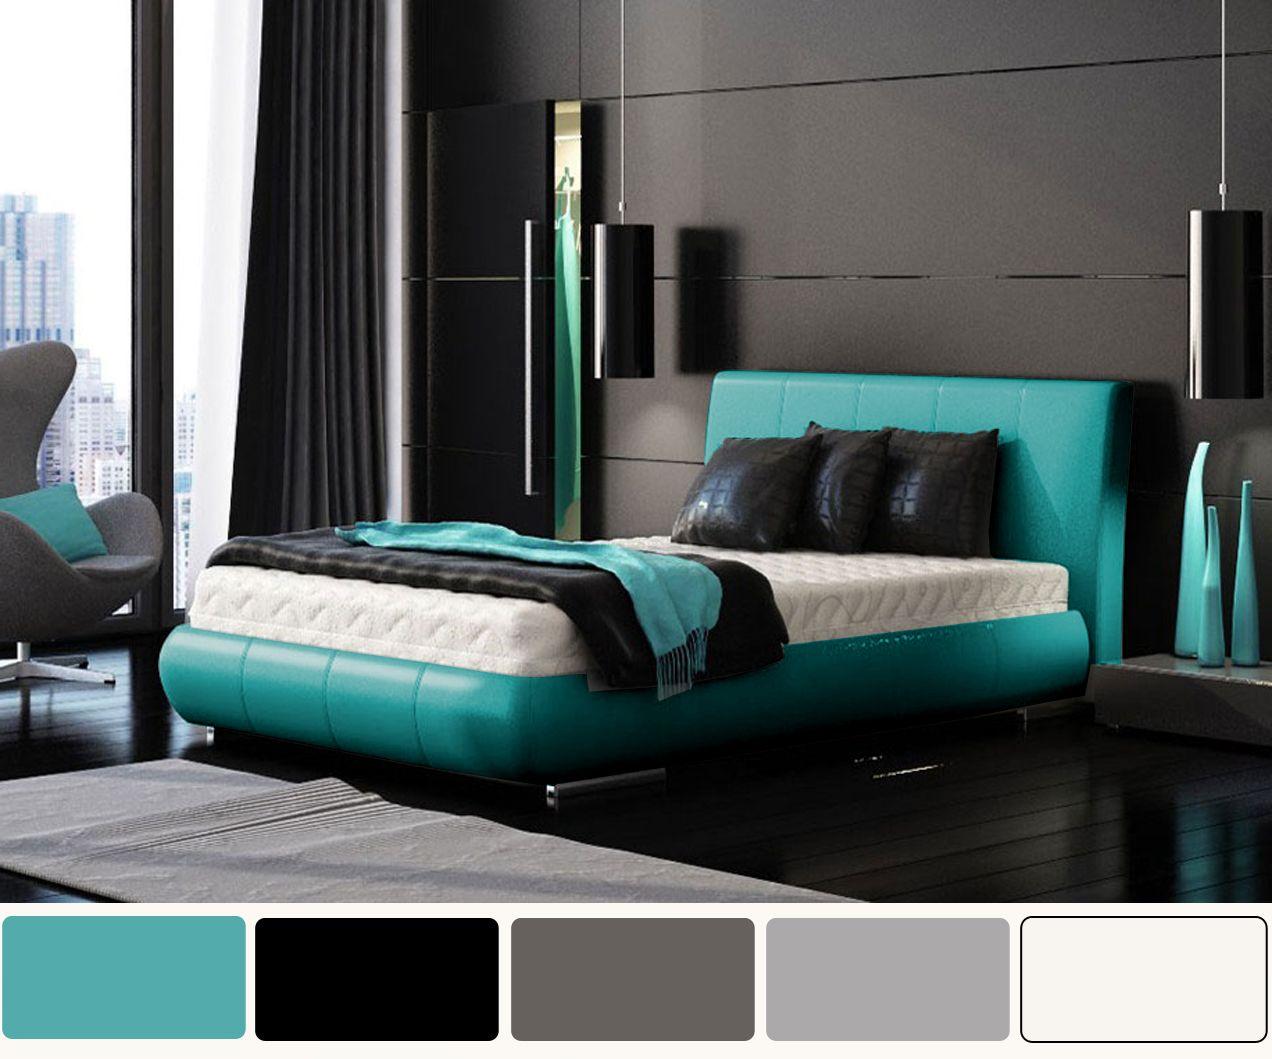 Bedroom| Delightful Turquoise Bedroom Interior And ...